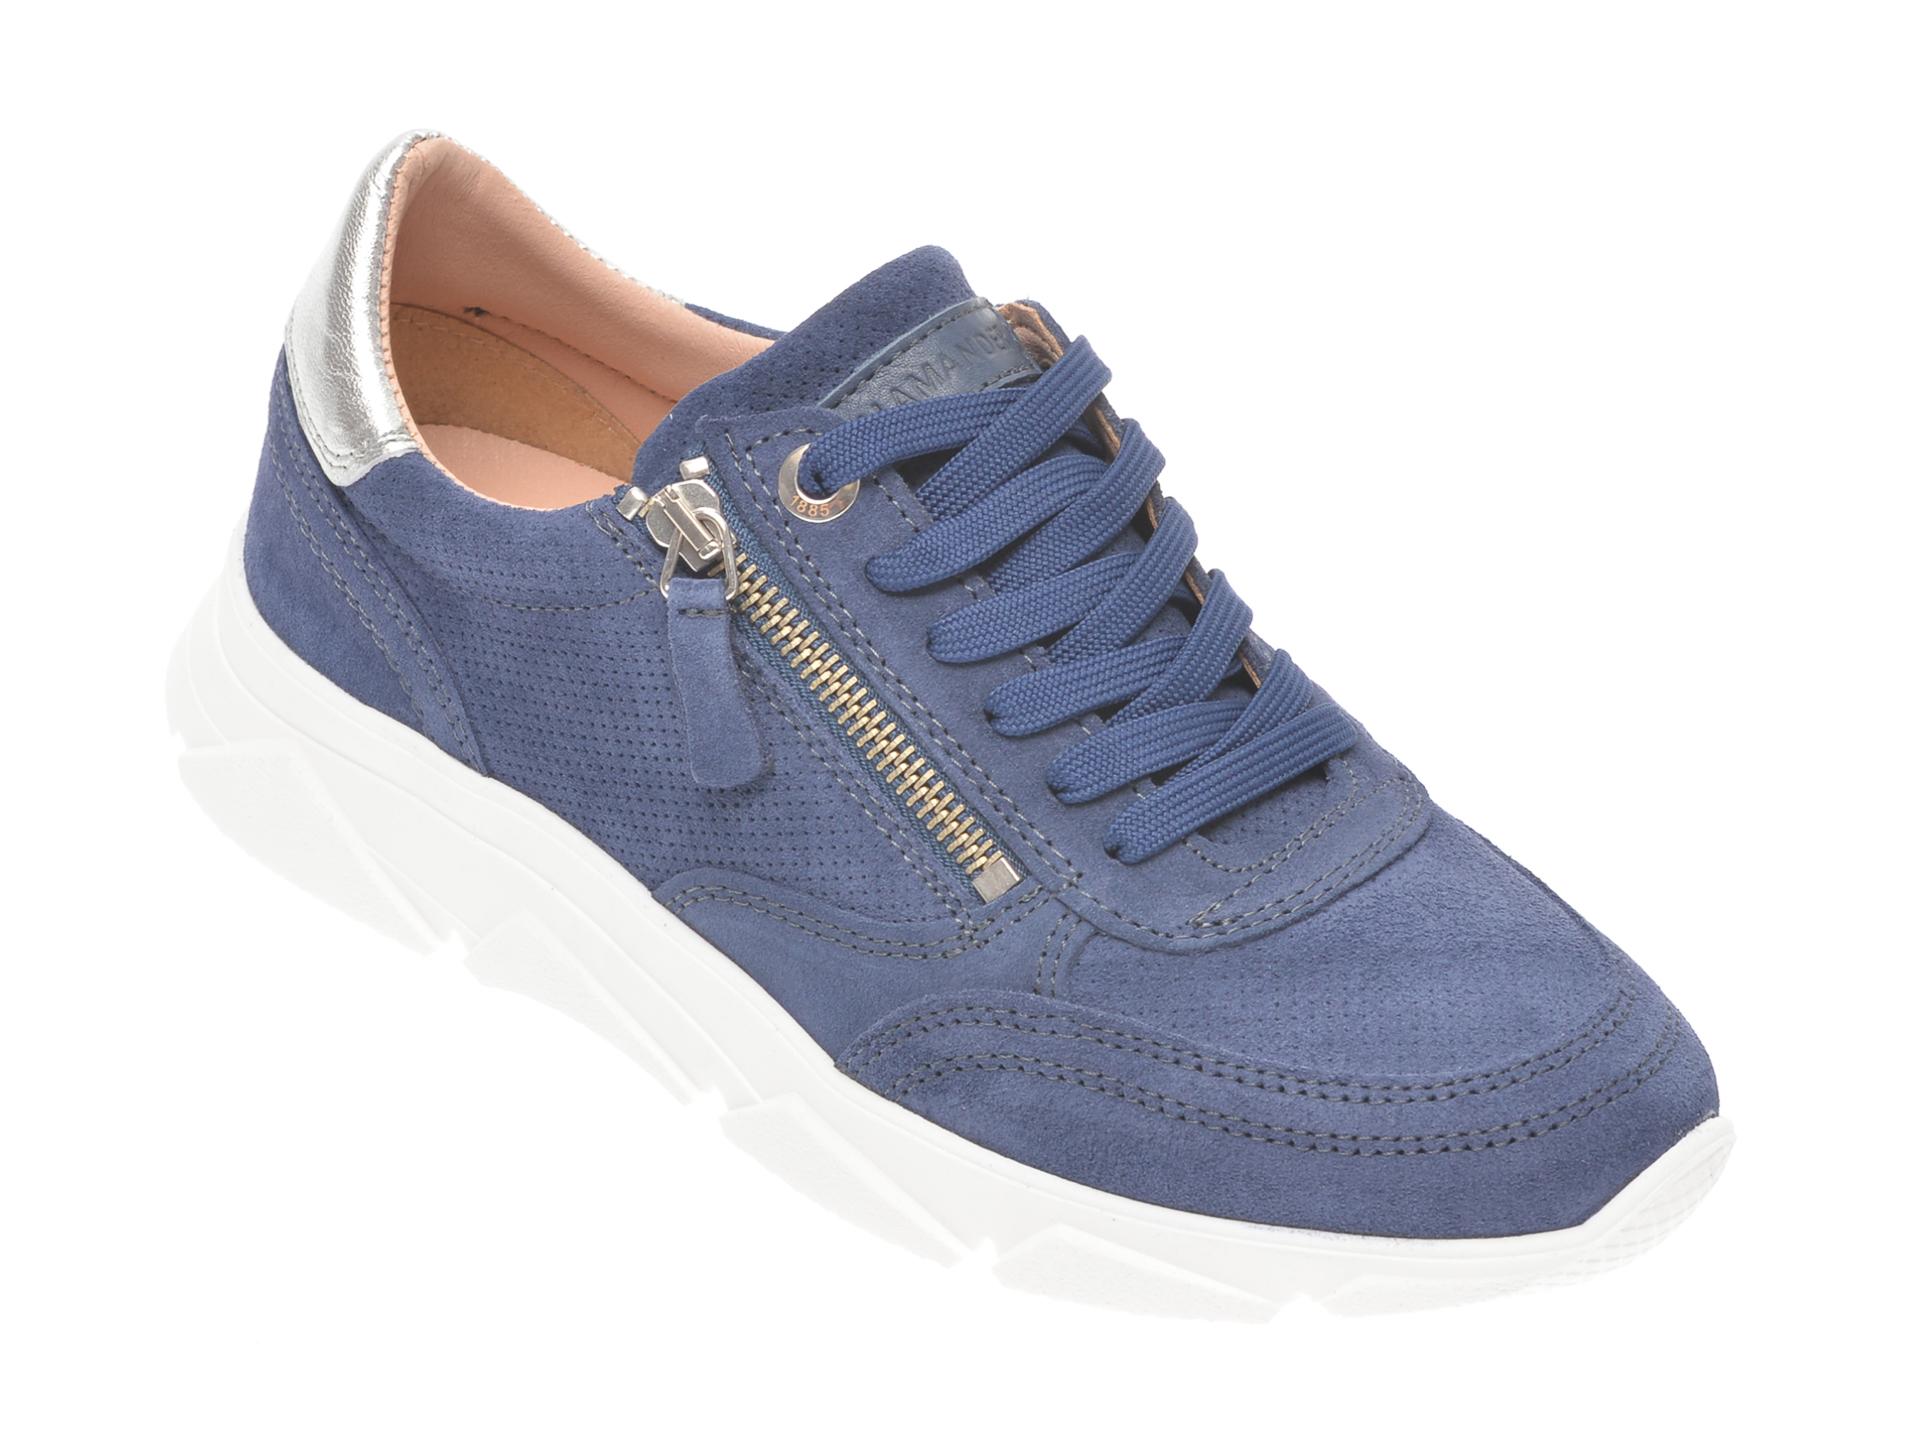 Pantofi sport SALAMANDER bleumarin 55402, din piele intoarsa